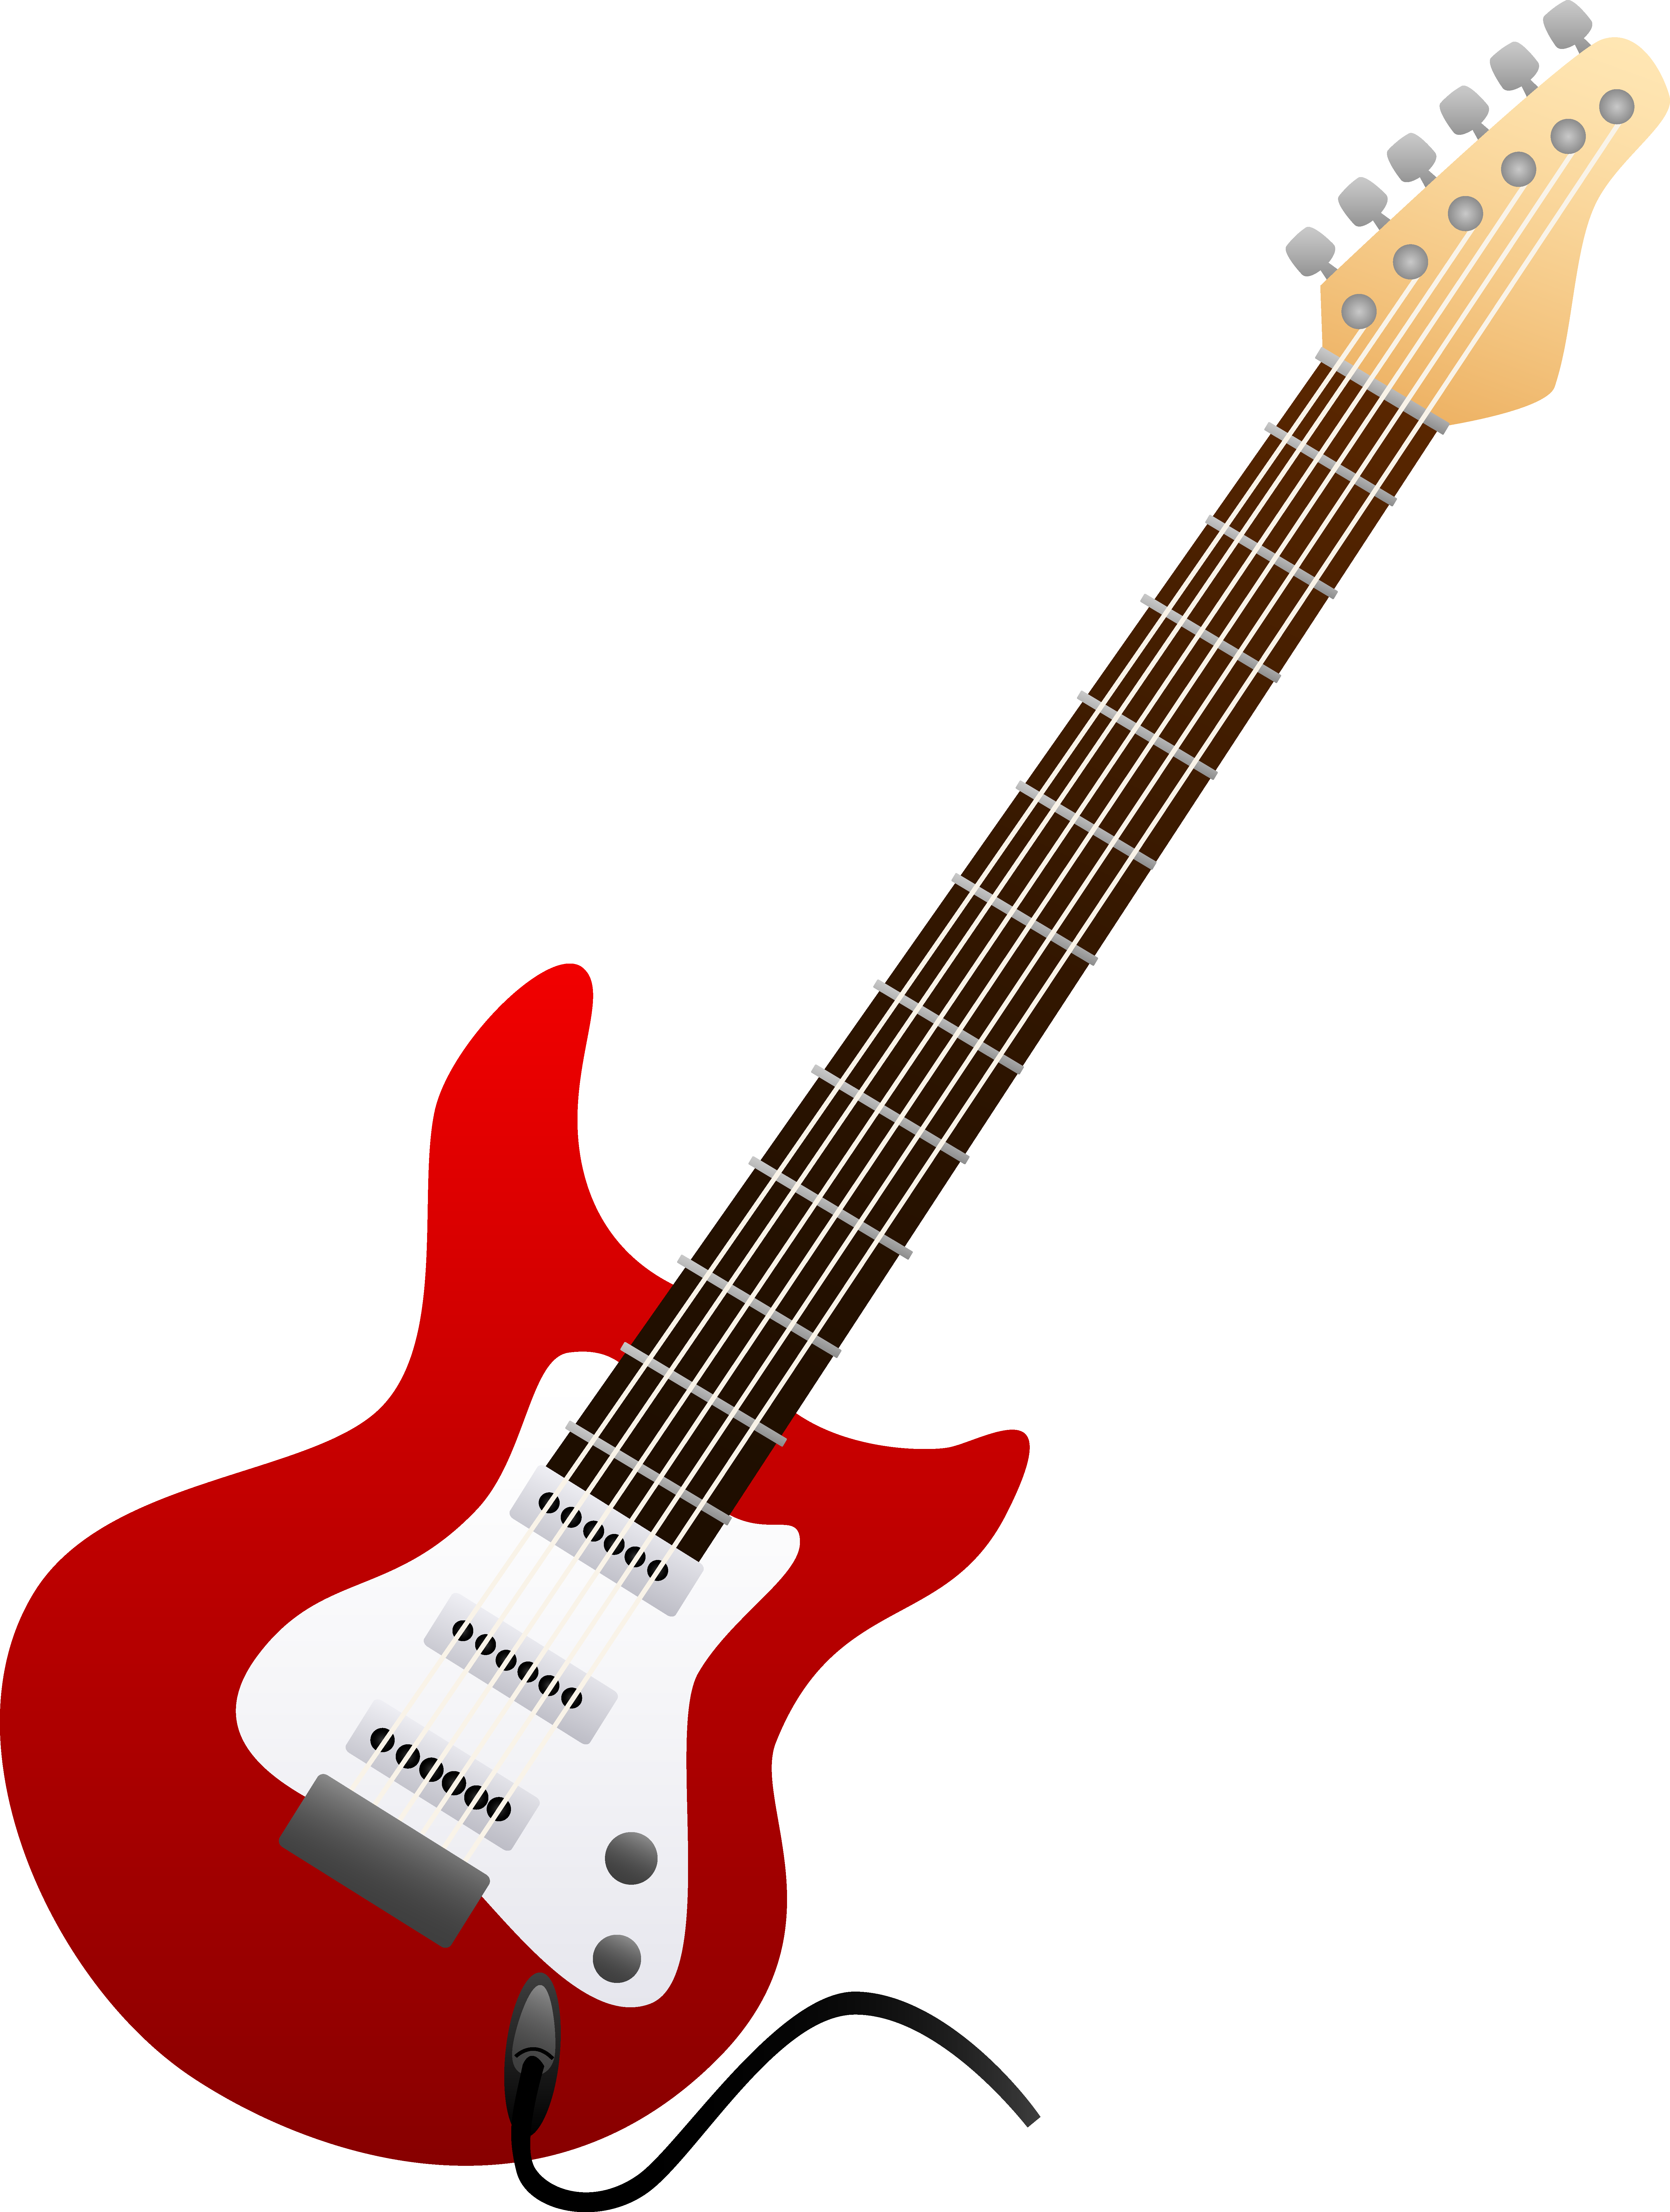 Rock star guitar clip art free clipart images.